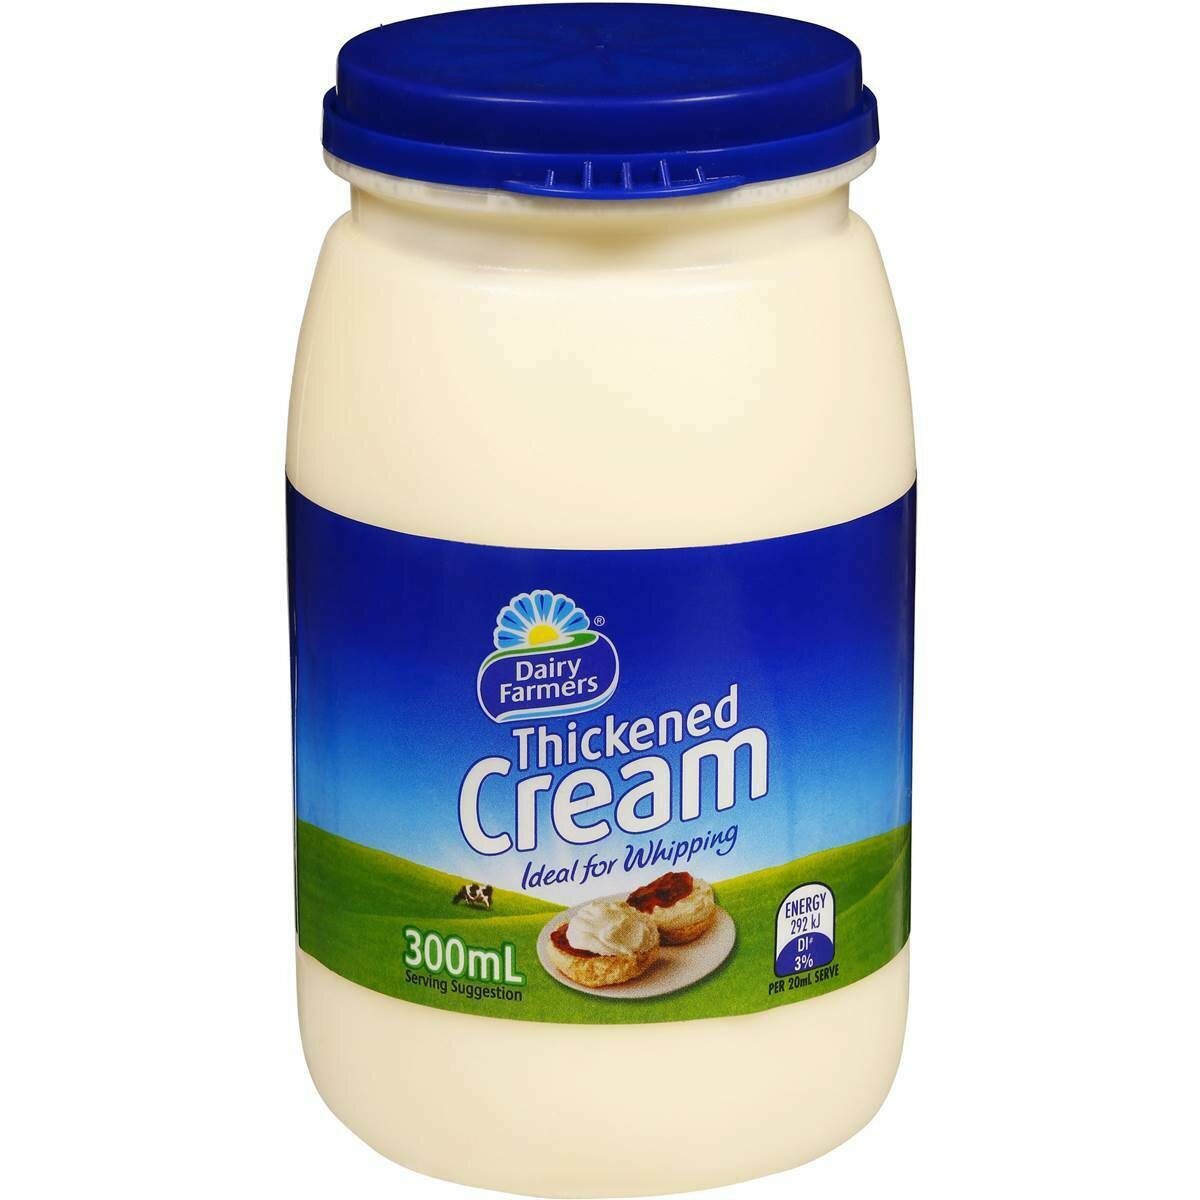 Dairy Farmers Thickened Cream 300ML